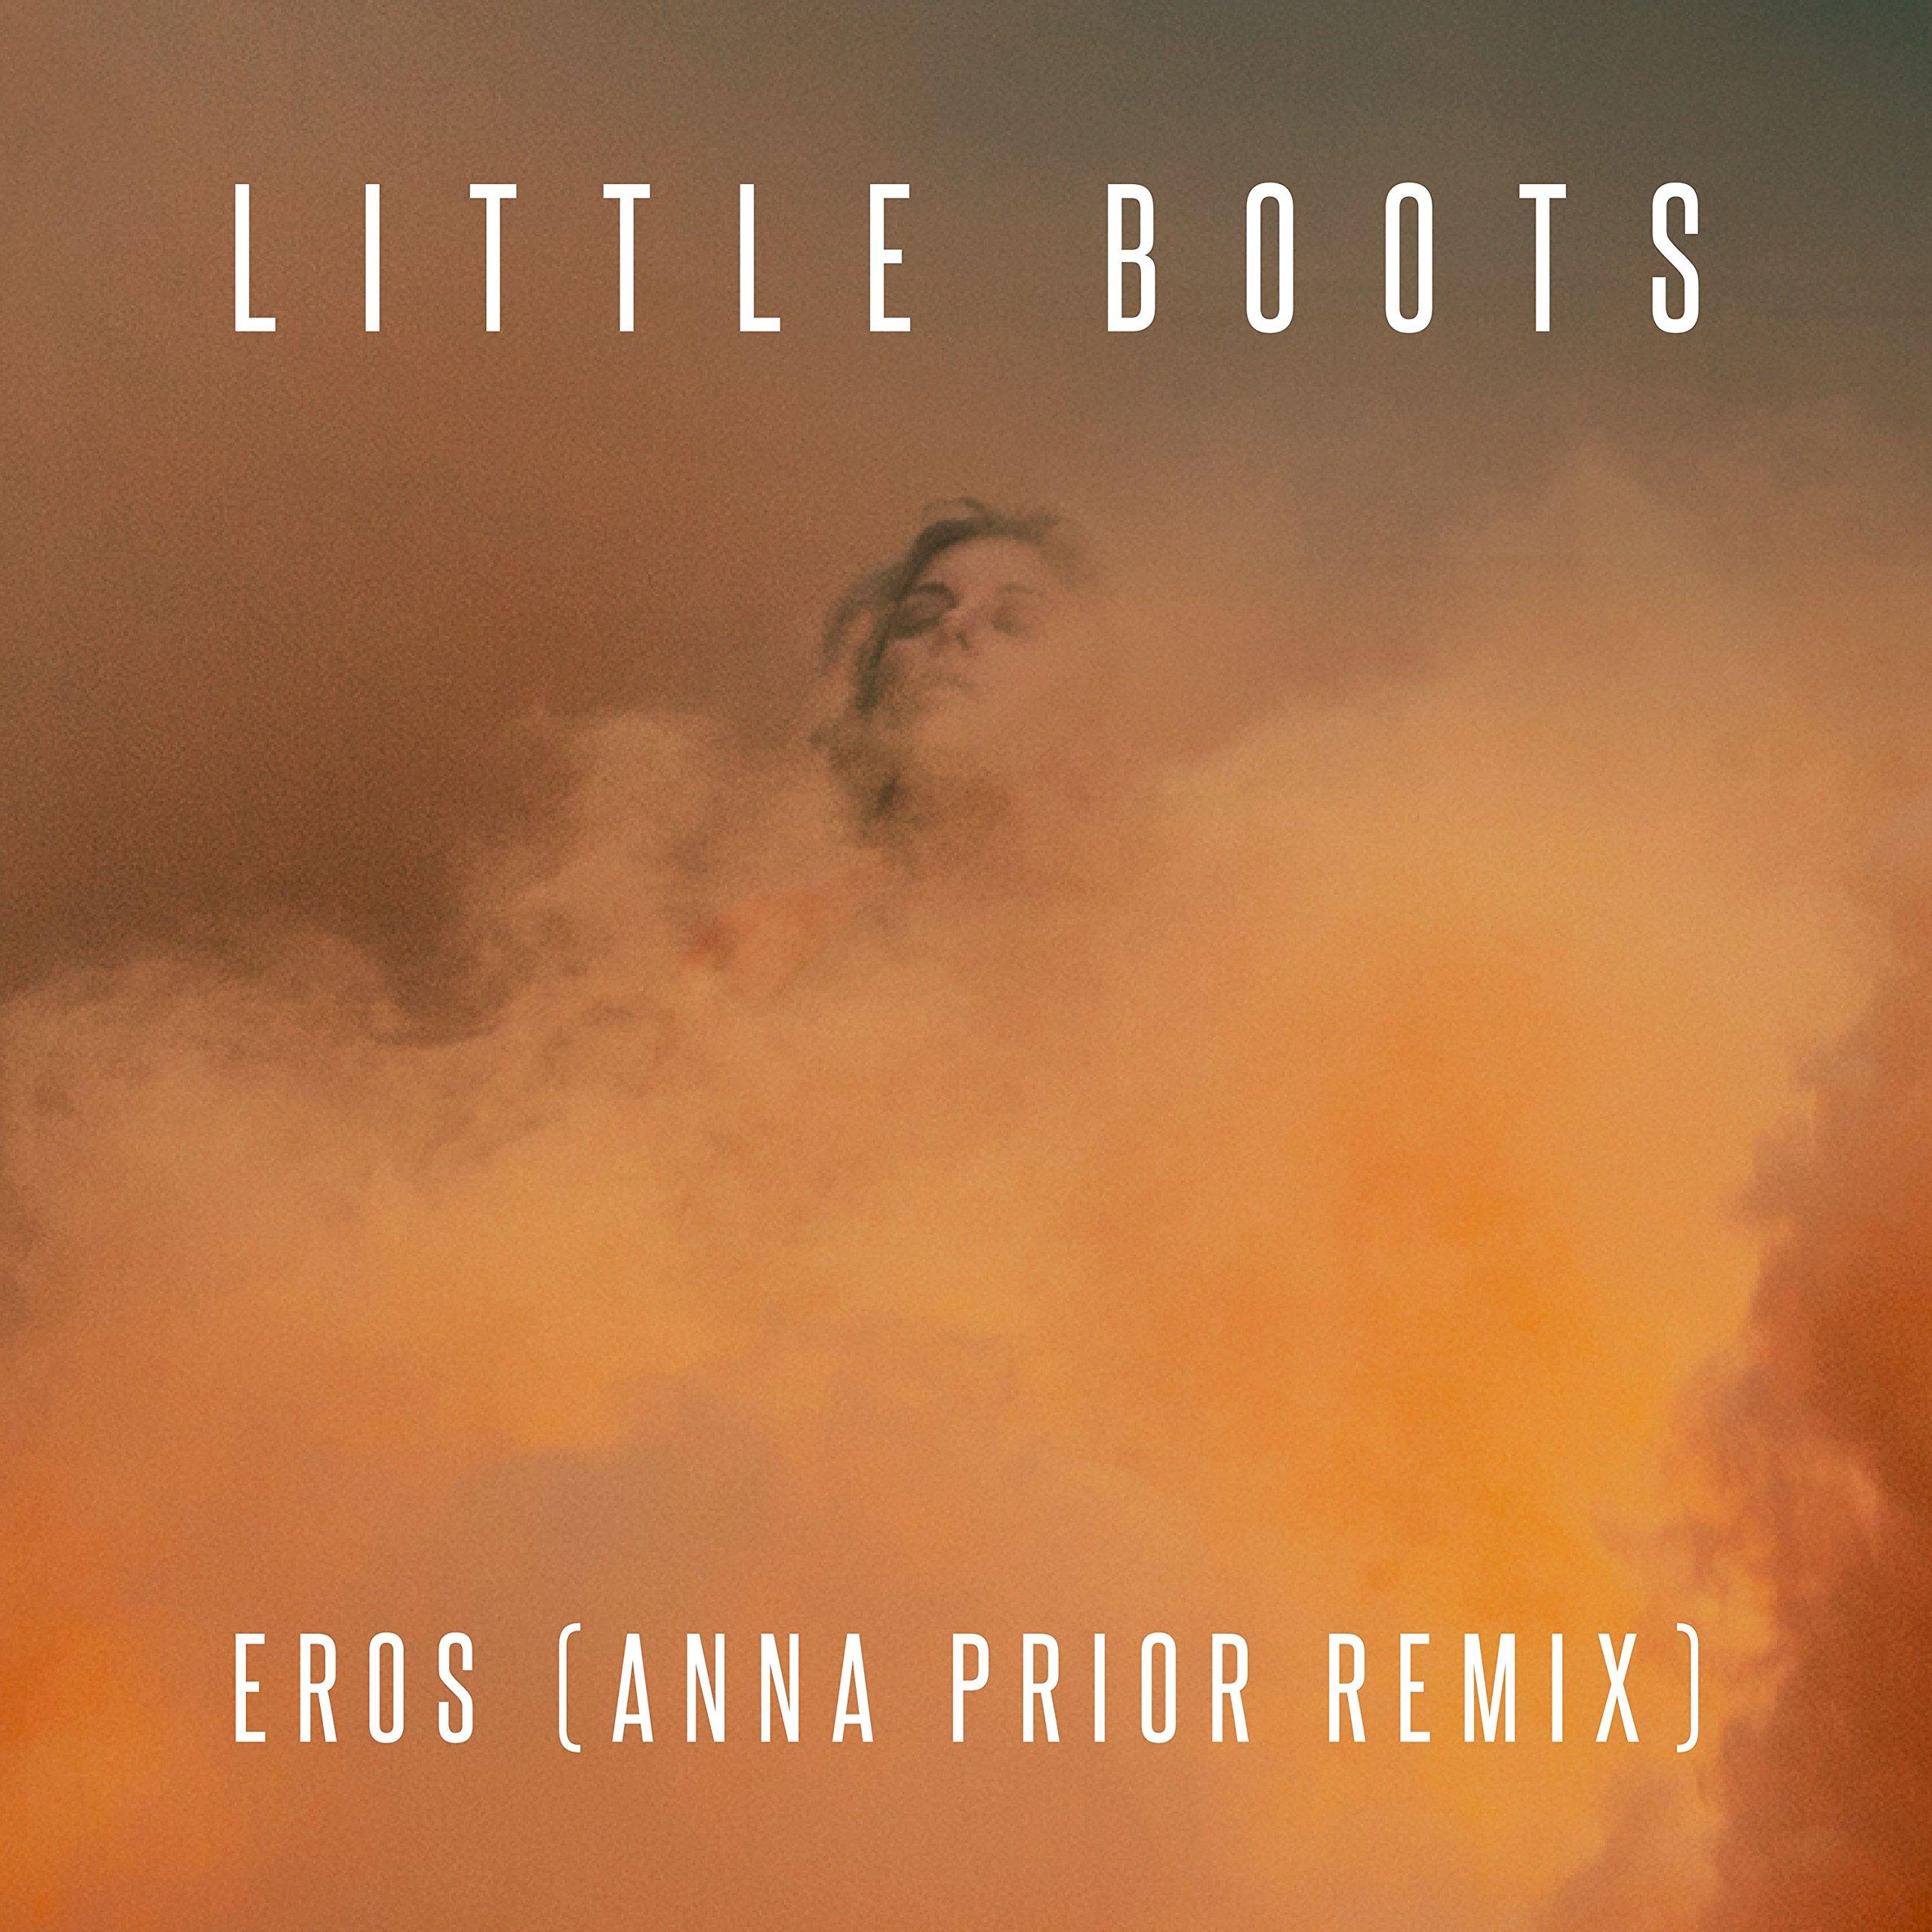 Cassette : Little Boots - Eros (anna Prior Remix) (Cassette)